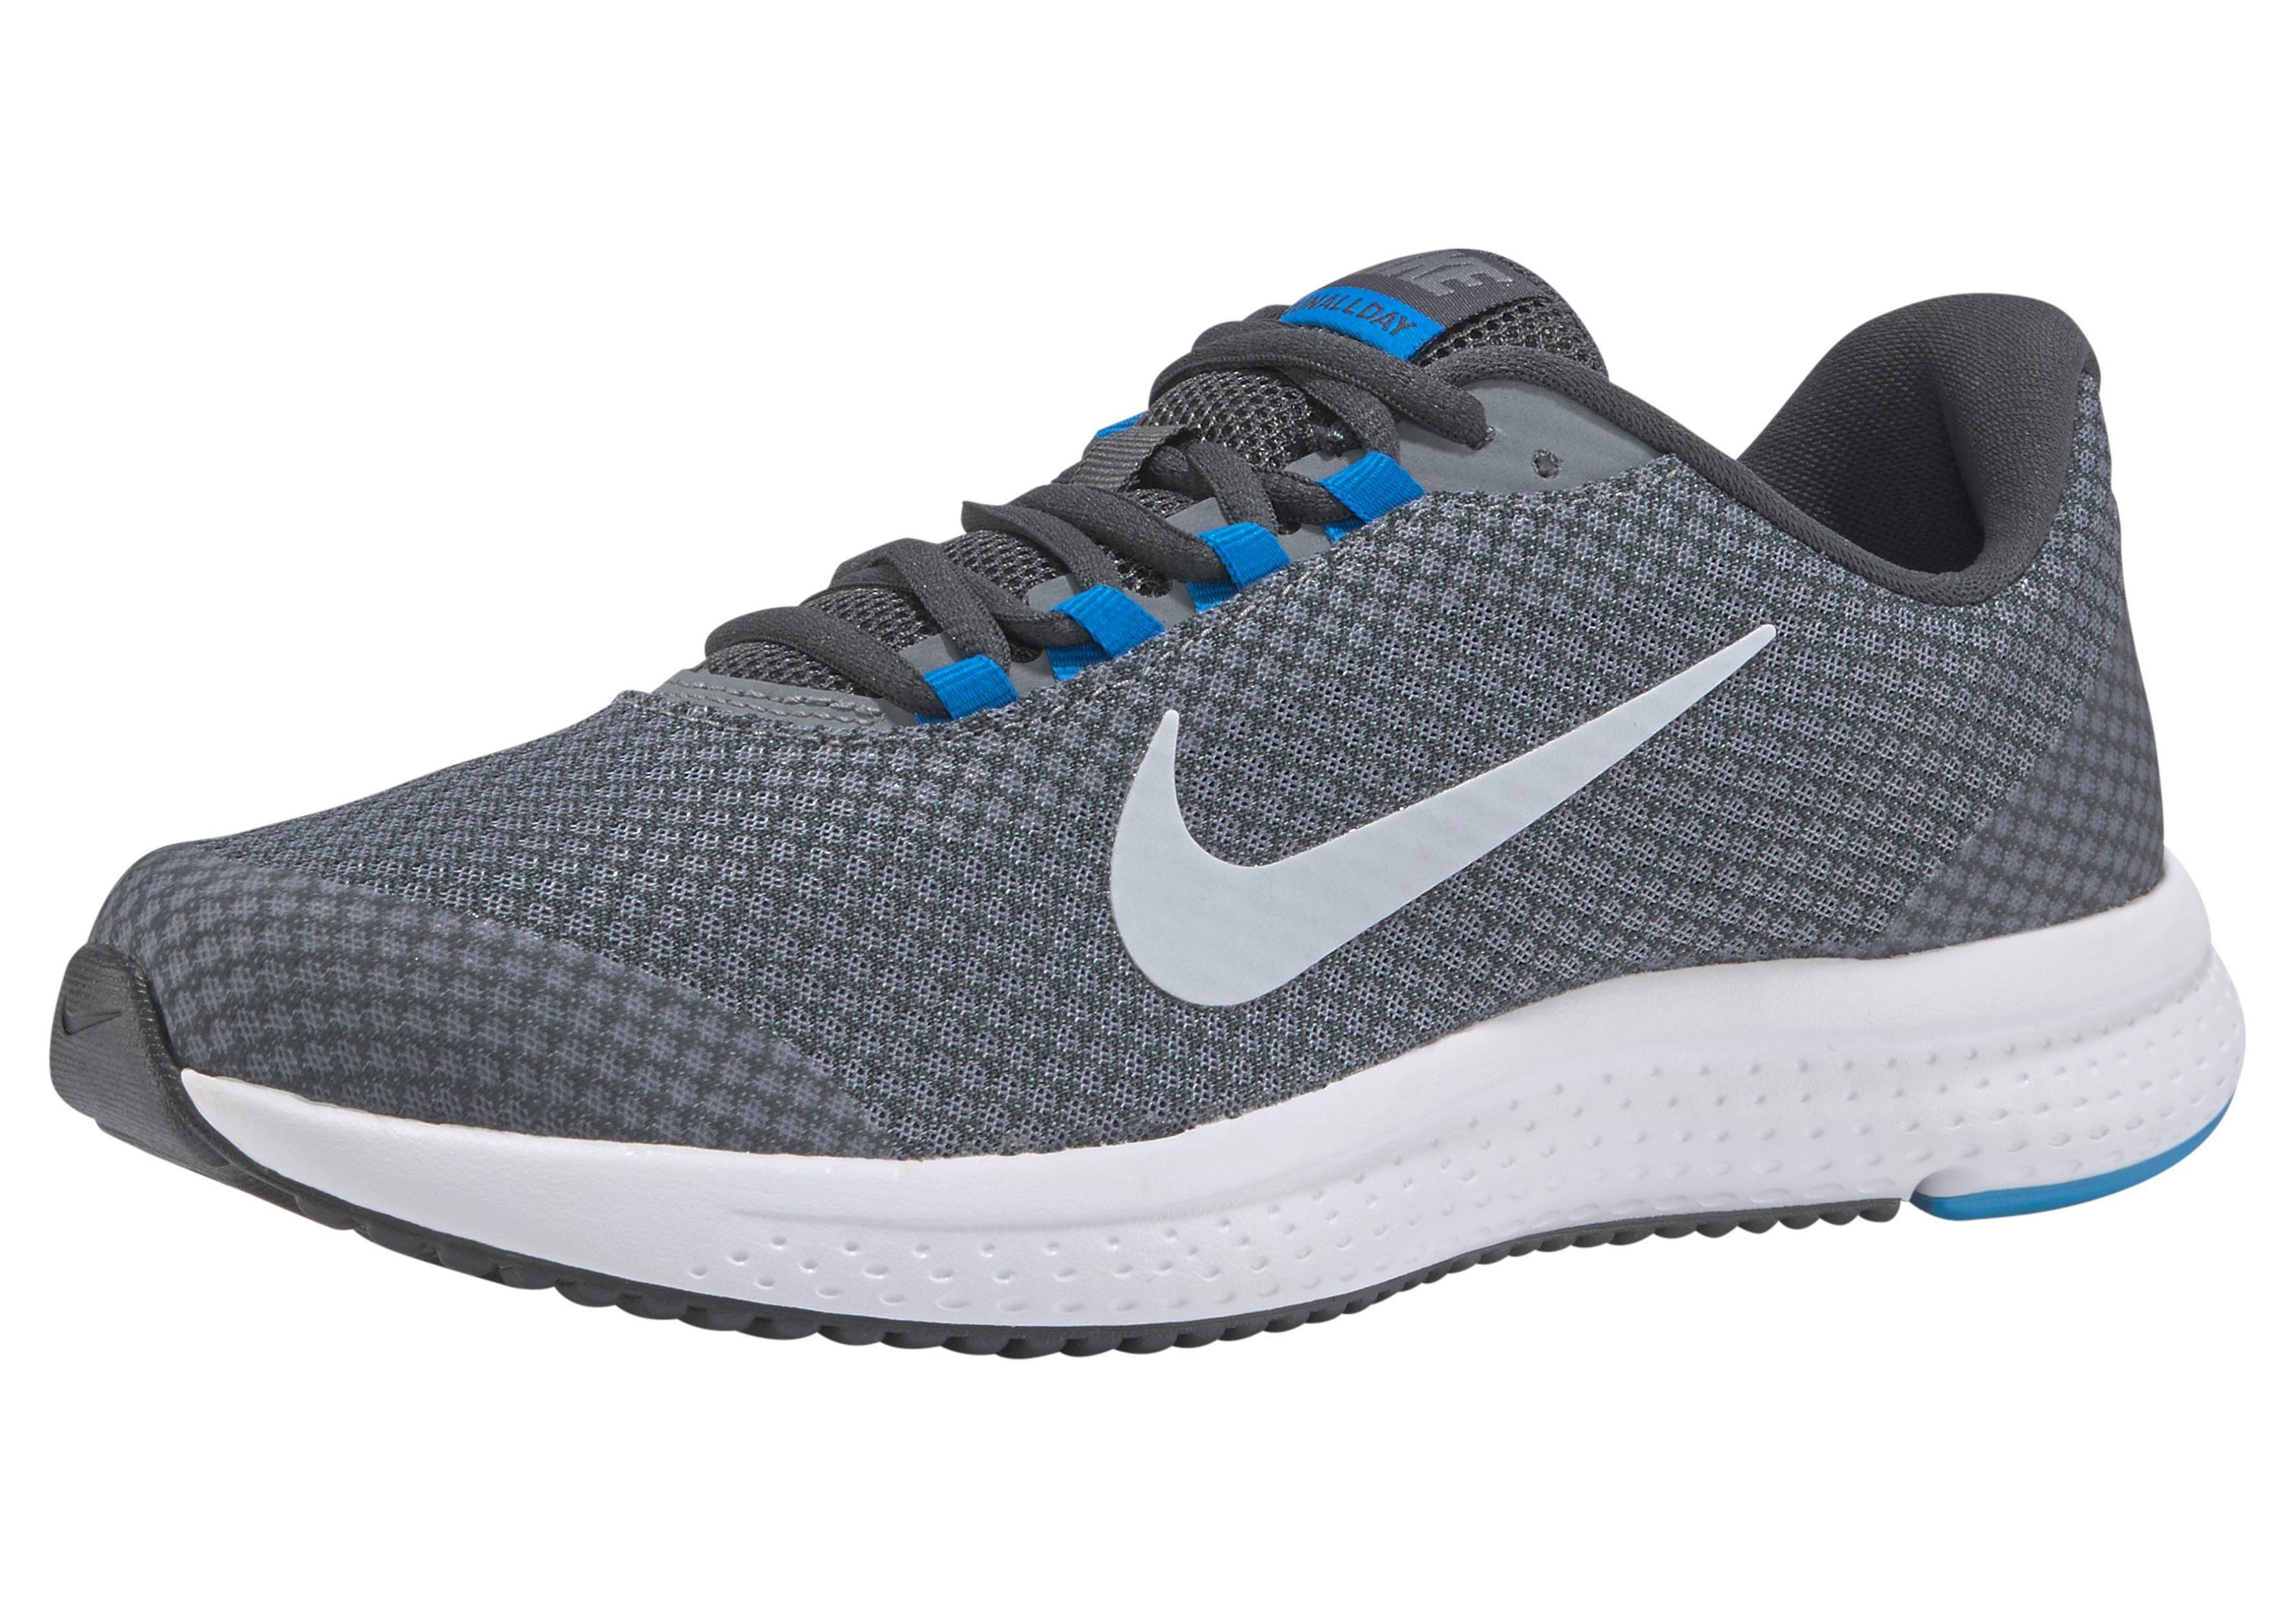 Nike »Runallday« Laufschuh, Atmungsaktives Obermaterial aus Mesh online kaufen   OTTO